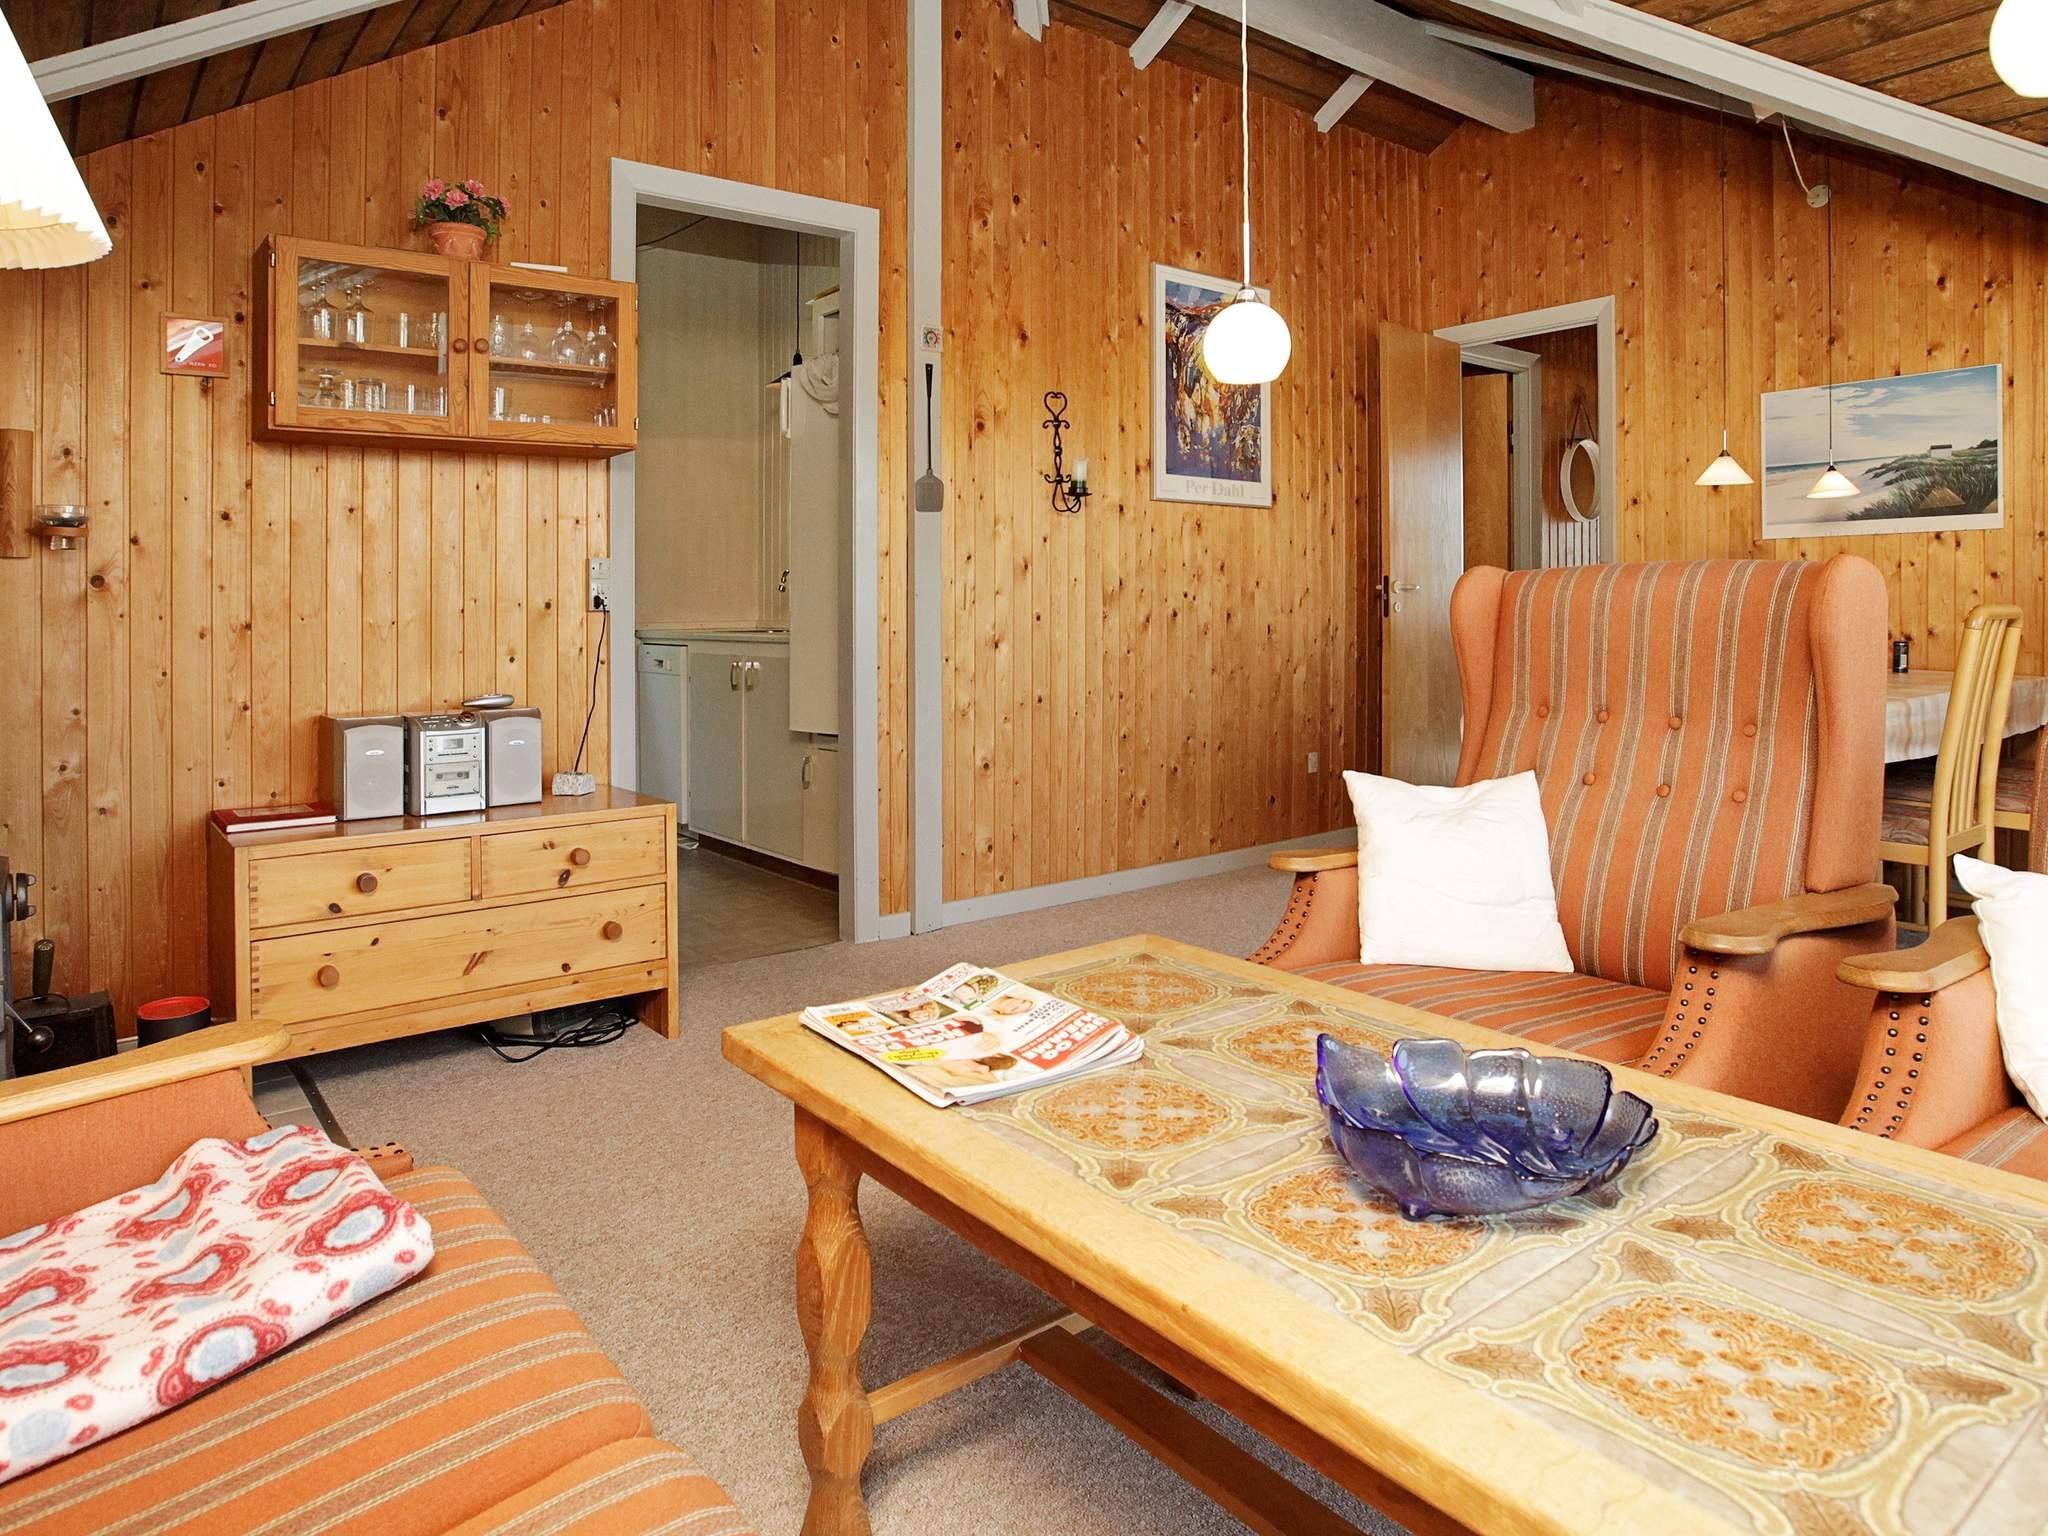 Ferienhaus Blåvand (88432), Blåvand, , Westjütland, Dänemark, Bild 2